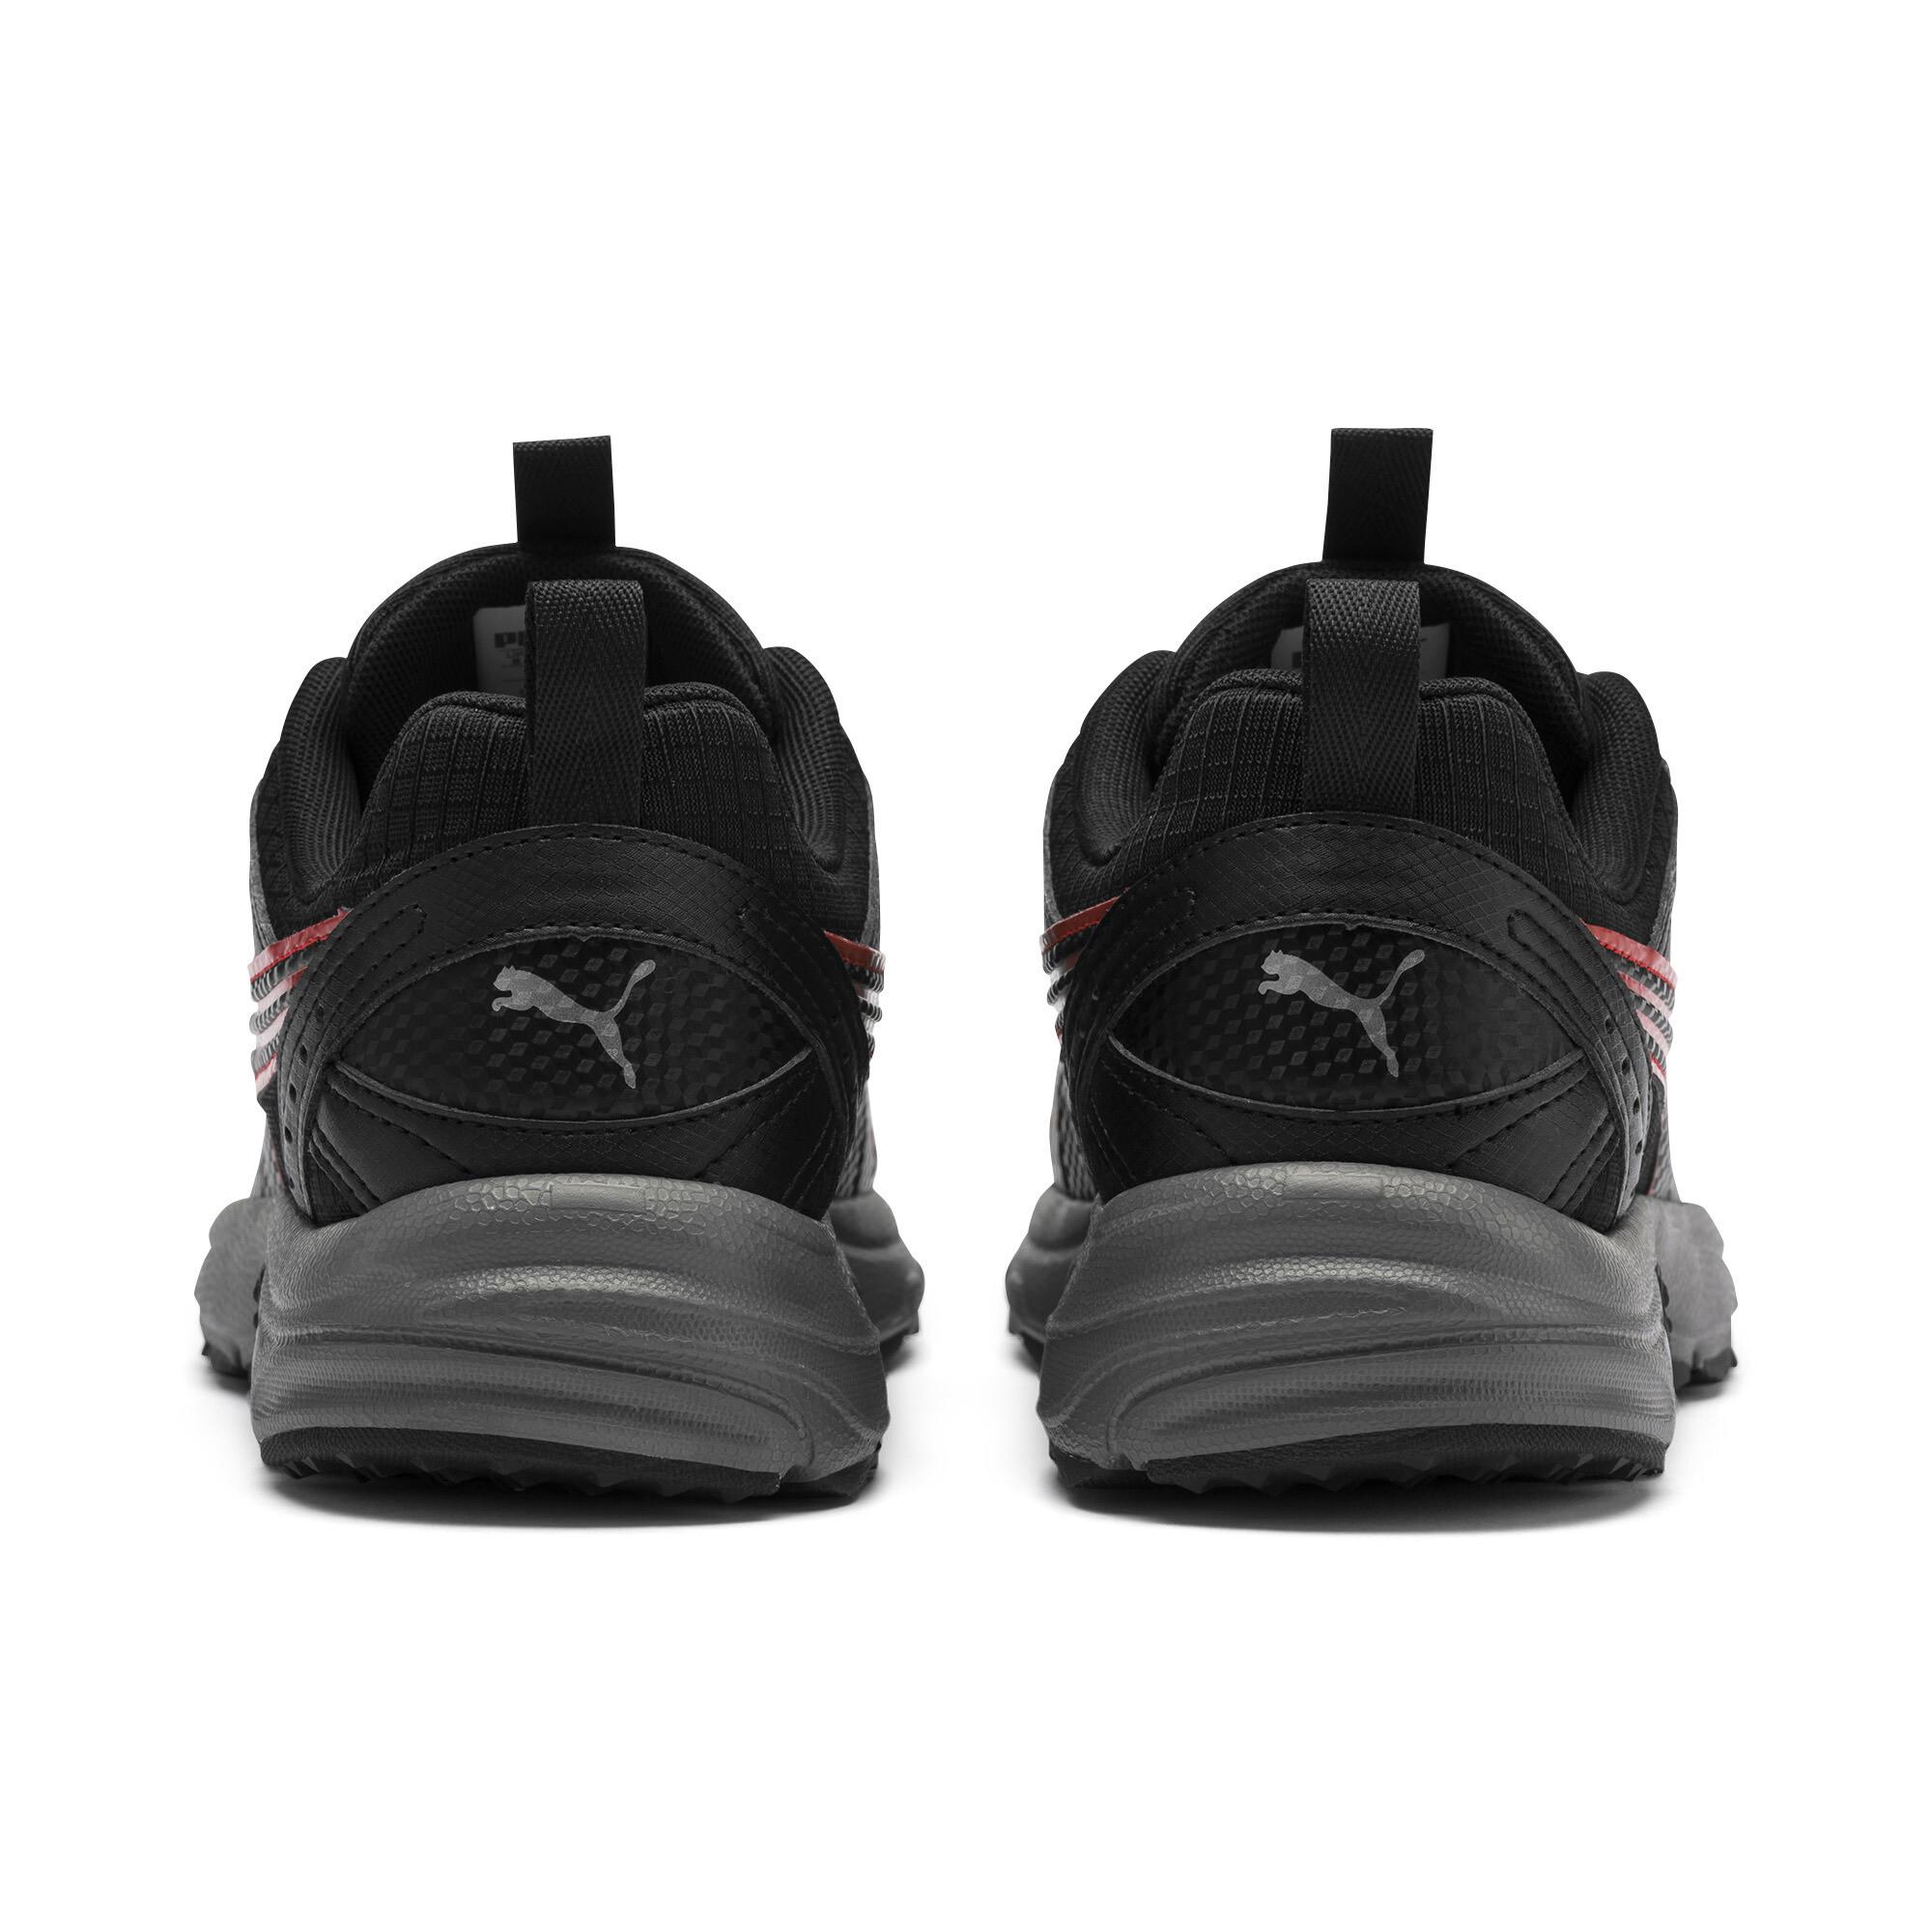 PUMA-Axis-Trail-Sneakers-Men-Shoe-Basics miniature 10